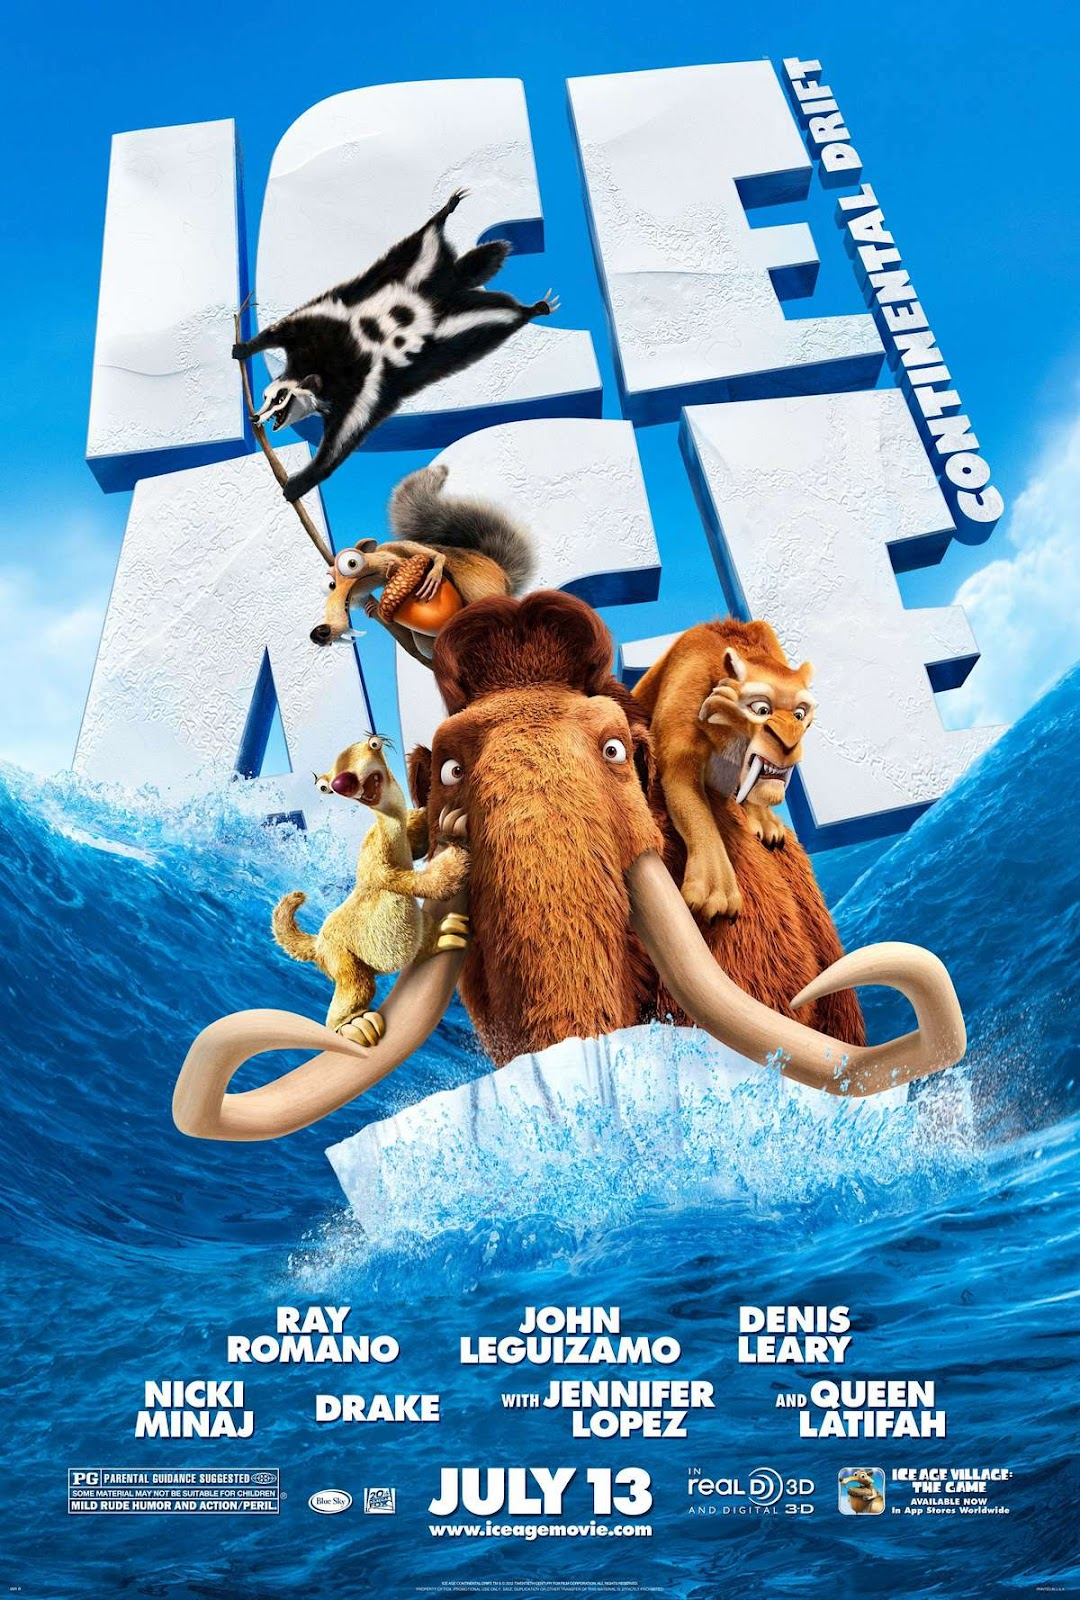 http://1.bp.blogspot.com/-XYL76Ub0rs4/T_NiFy4j_qI/AAAAAAAAA3Y/zVuFiel2_7k/s1600/iceagecontinentaldrift_poster.jpg